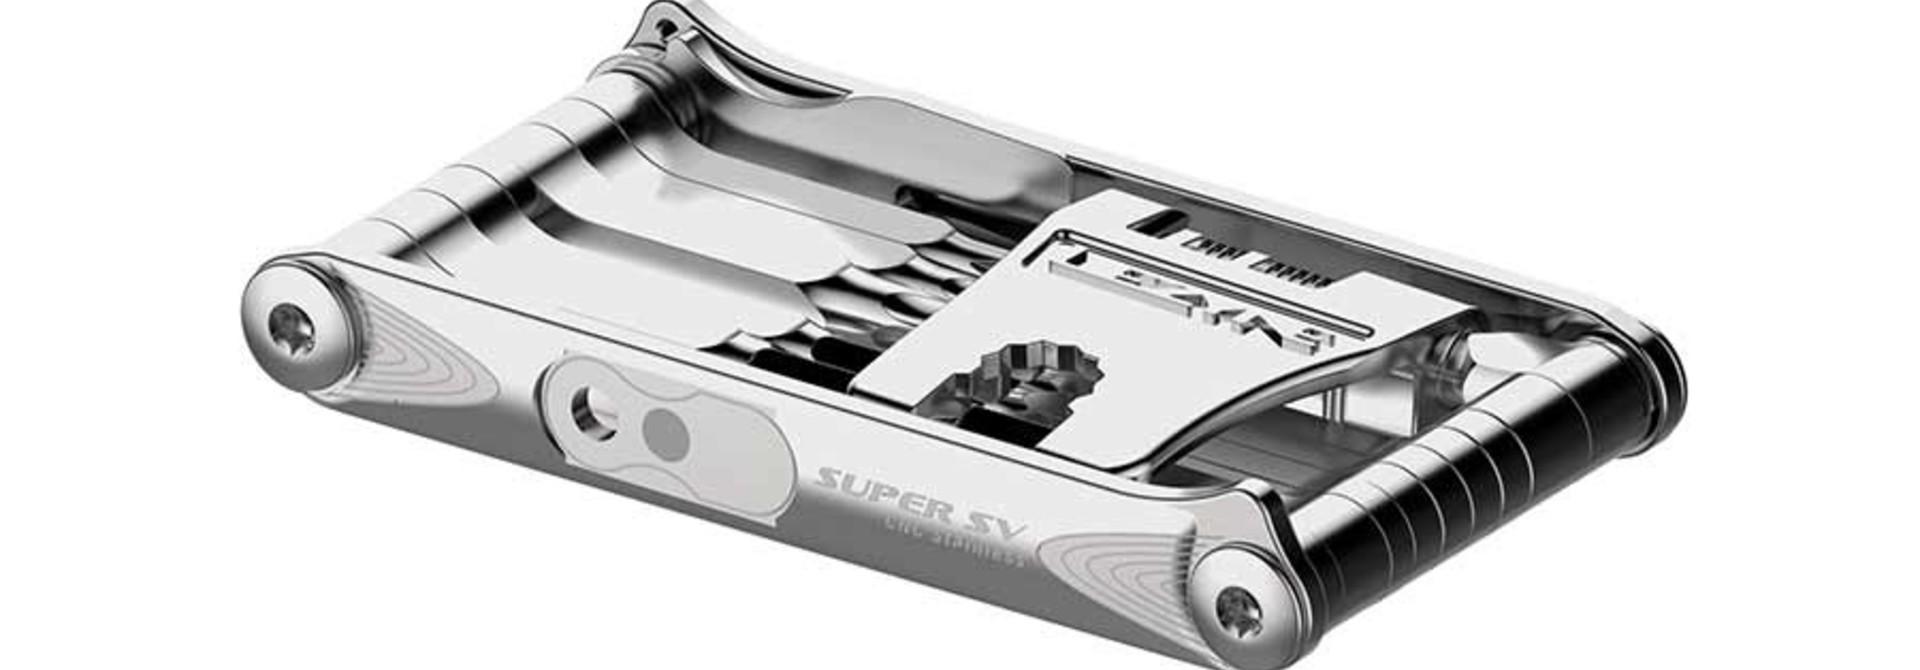 Lezyne, Super SV23, Multi-Tools - Silver